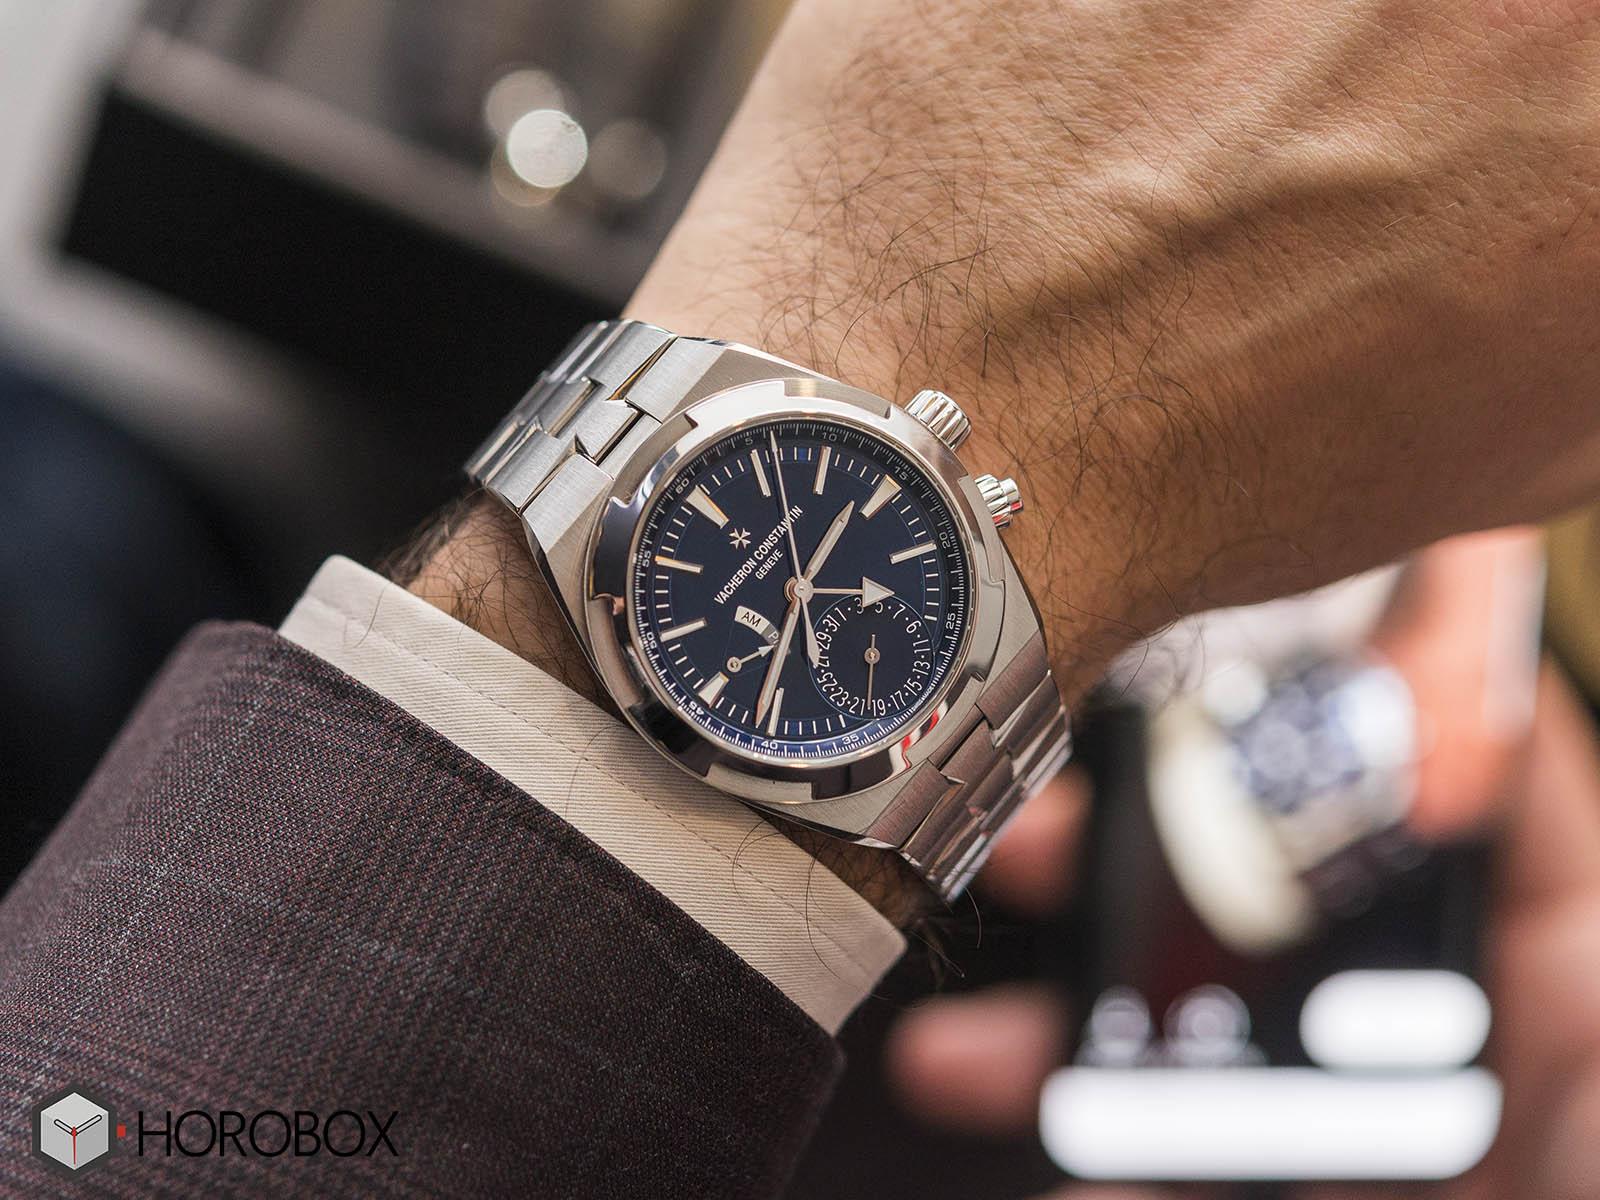 7900v110a-b334-Vacheron-Constantin-Overseas-Dual-Time-Sihh-2018-1.jpg